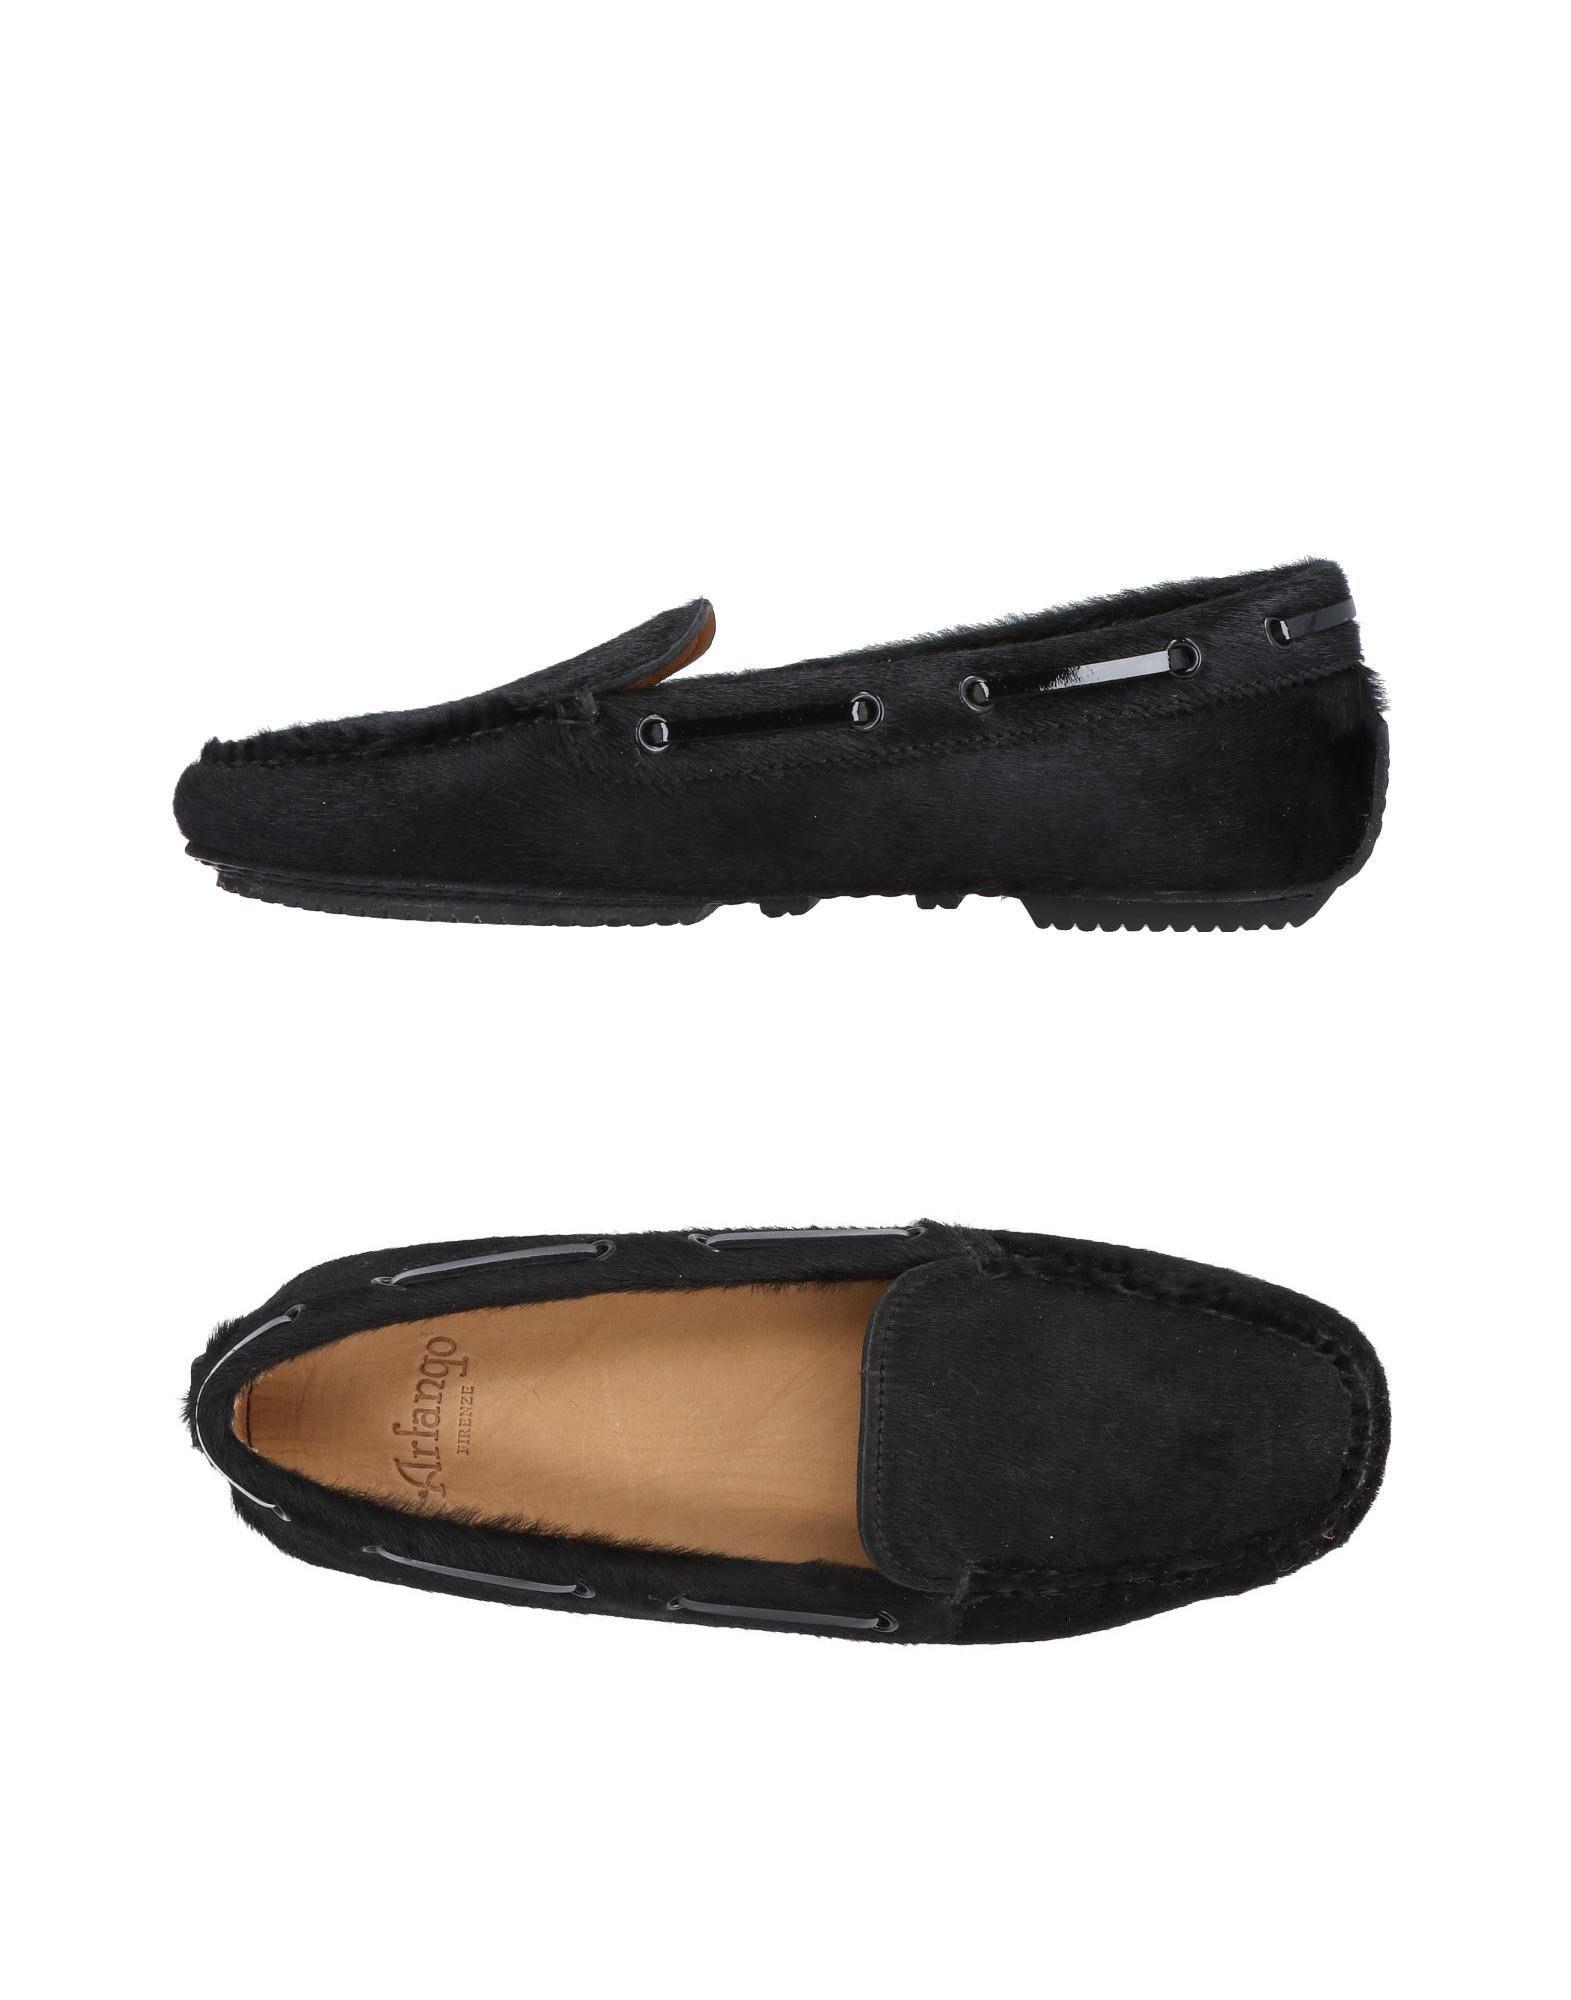 Stilvolle billige Mokassins Schuhe Arfango Mokassins billige Damen  11476358BI ce5a5f